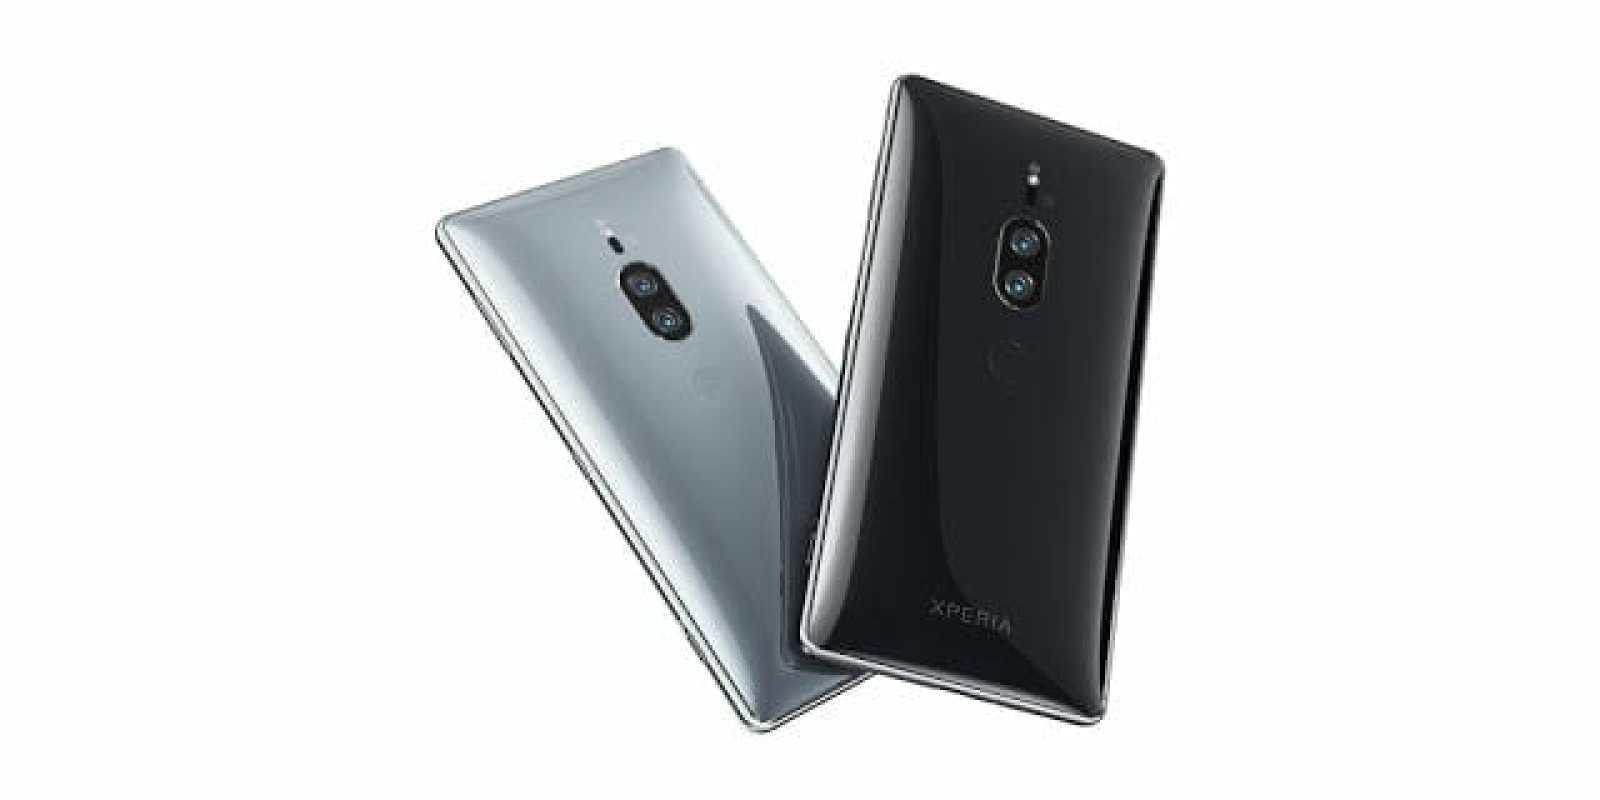 - sony xperia xz2 premium head 2 - รวมที่สุดของเทคโนโลยีใน Sony Xperia มีอะไรบ้างมาดูกัน